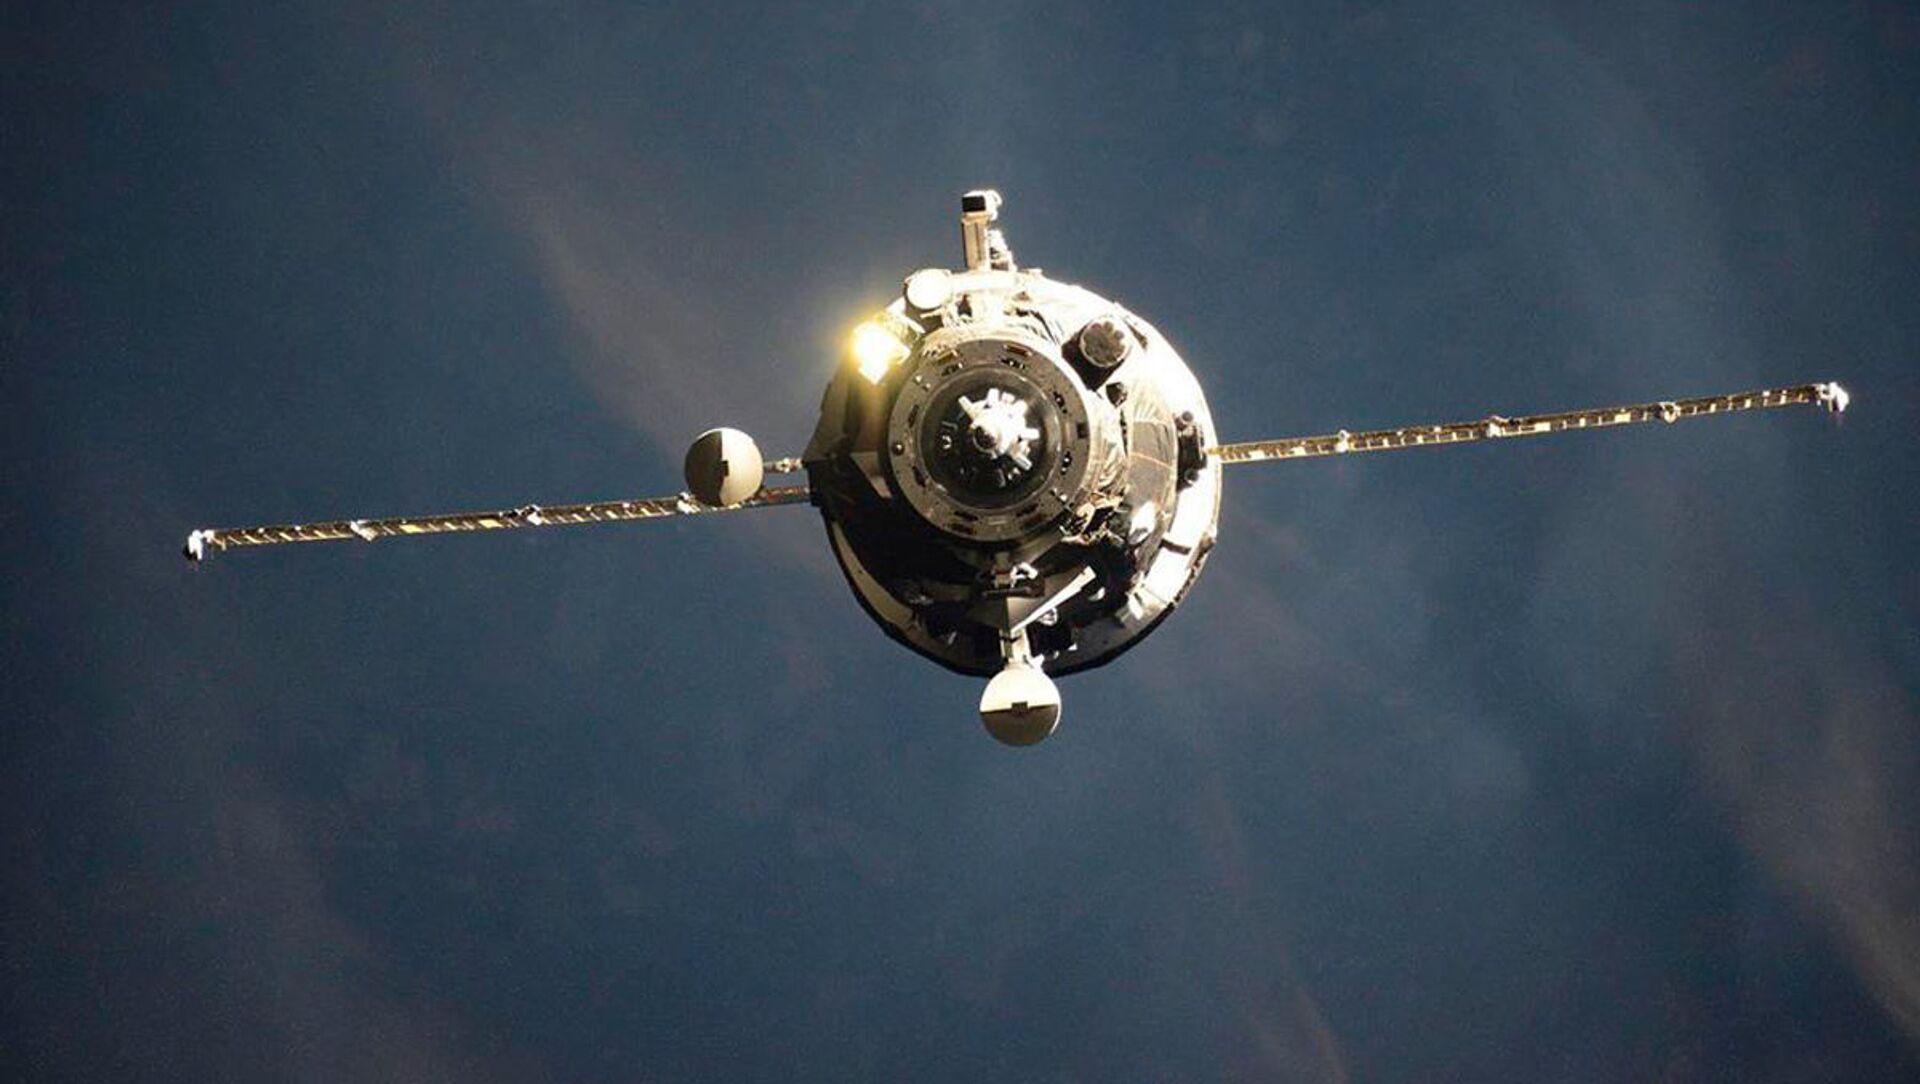 Nave da carico Progress MS-14 - Sputnik Italia, 1920, 28.03.2021